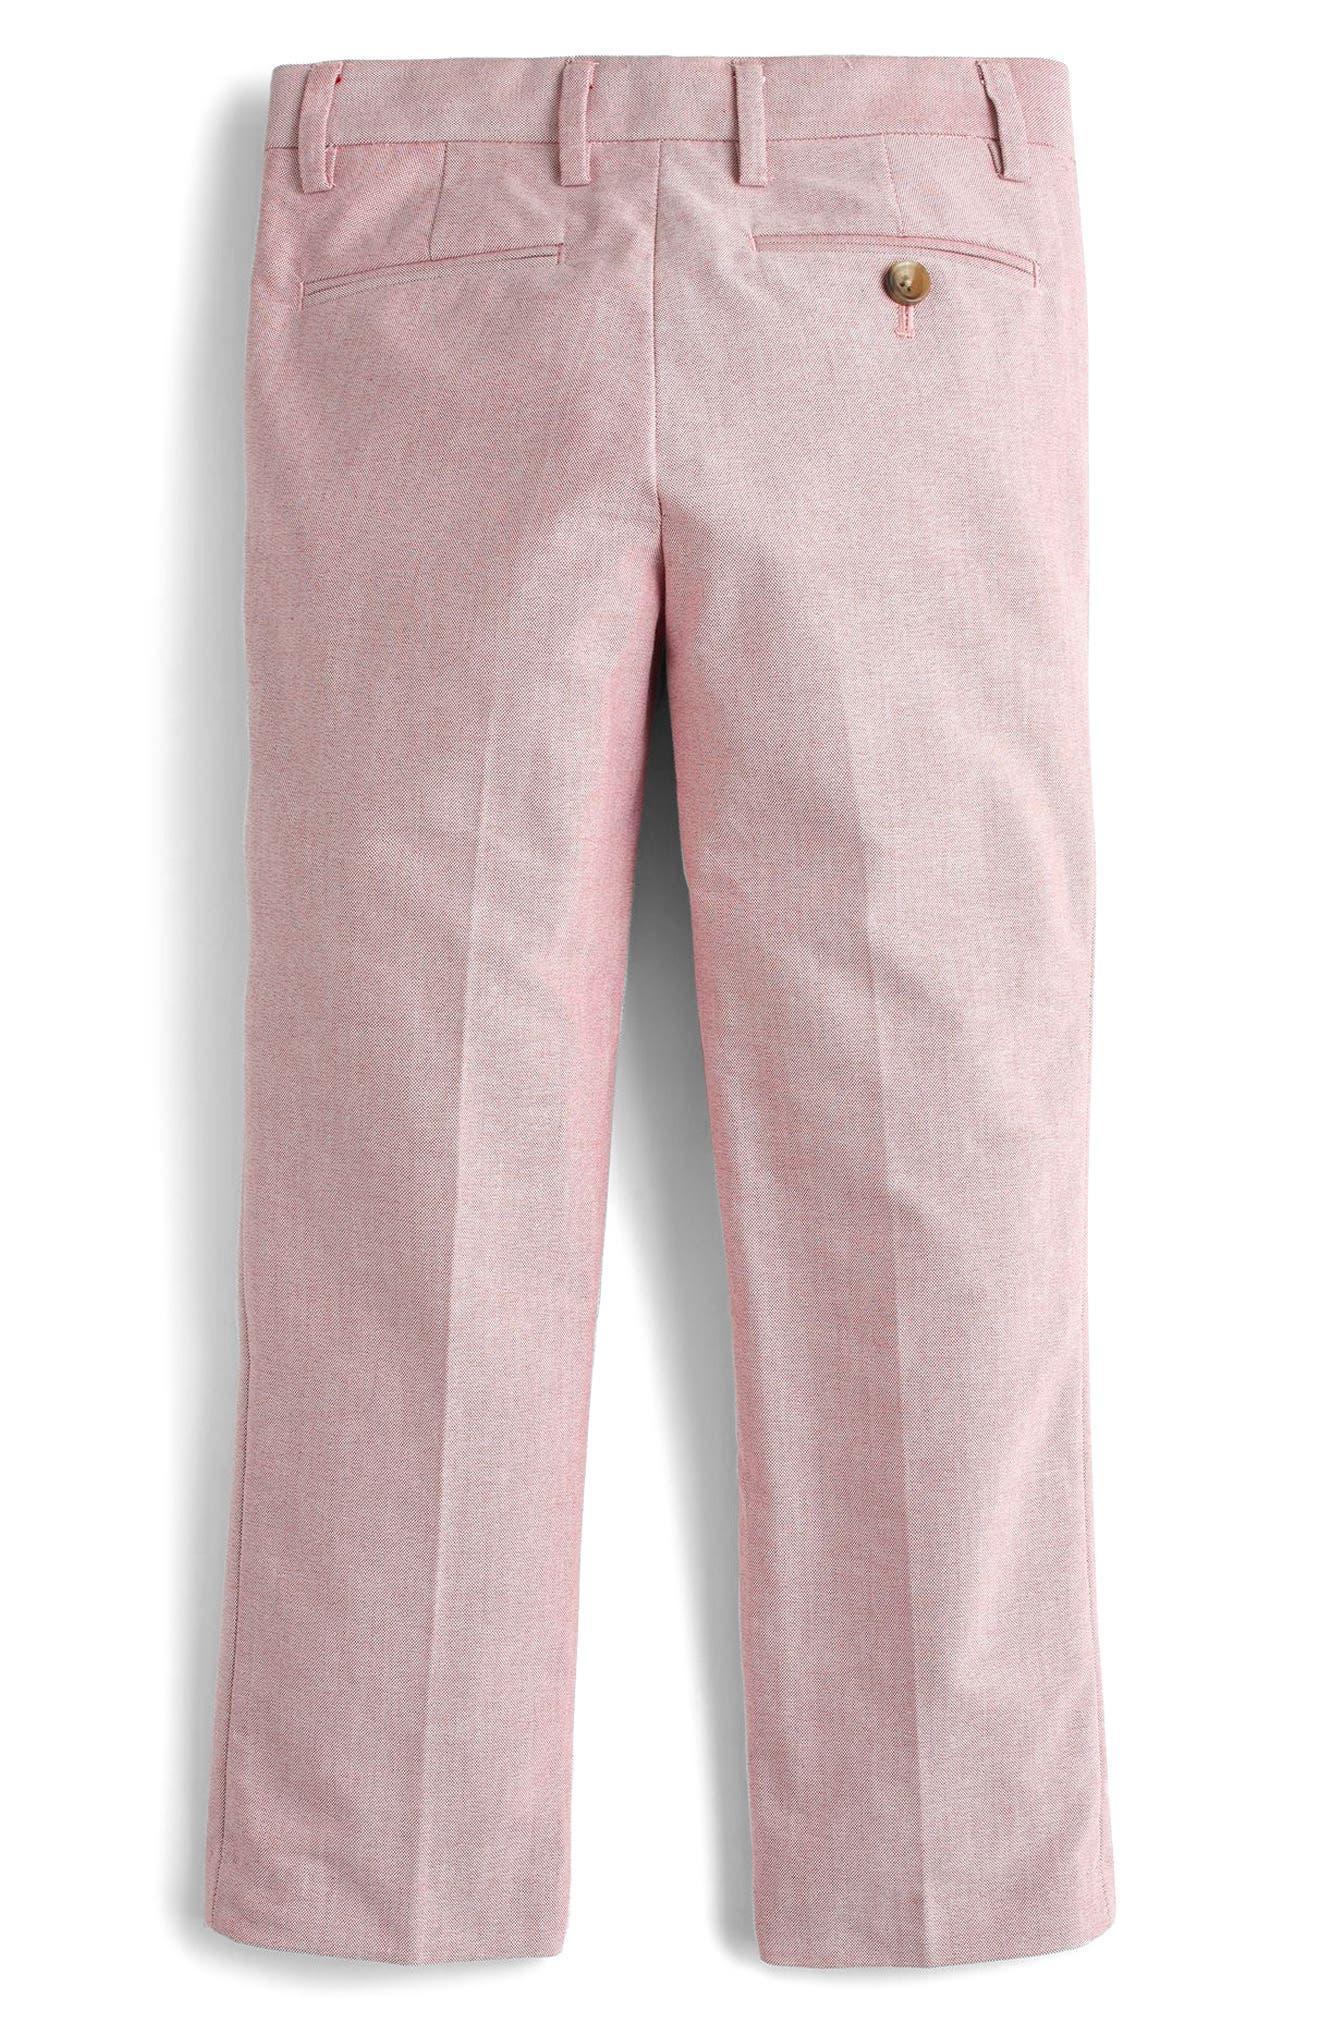 CREWCUTS BY J.CREW,                             Ludlow Stretch Oxford Suit Pants,                             Alternate thumbnail 2, color,                             600